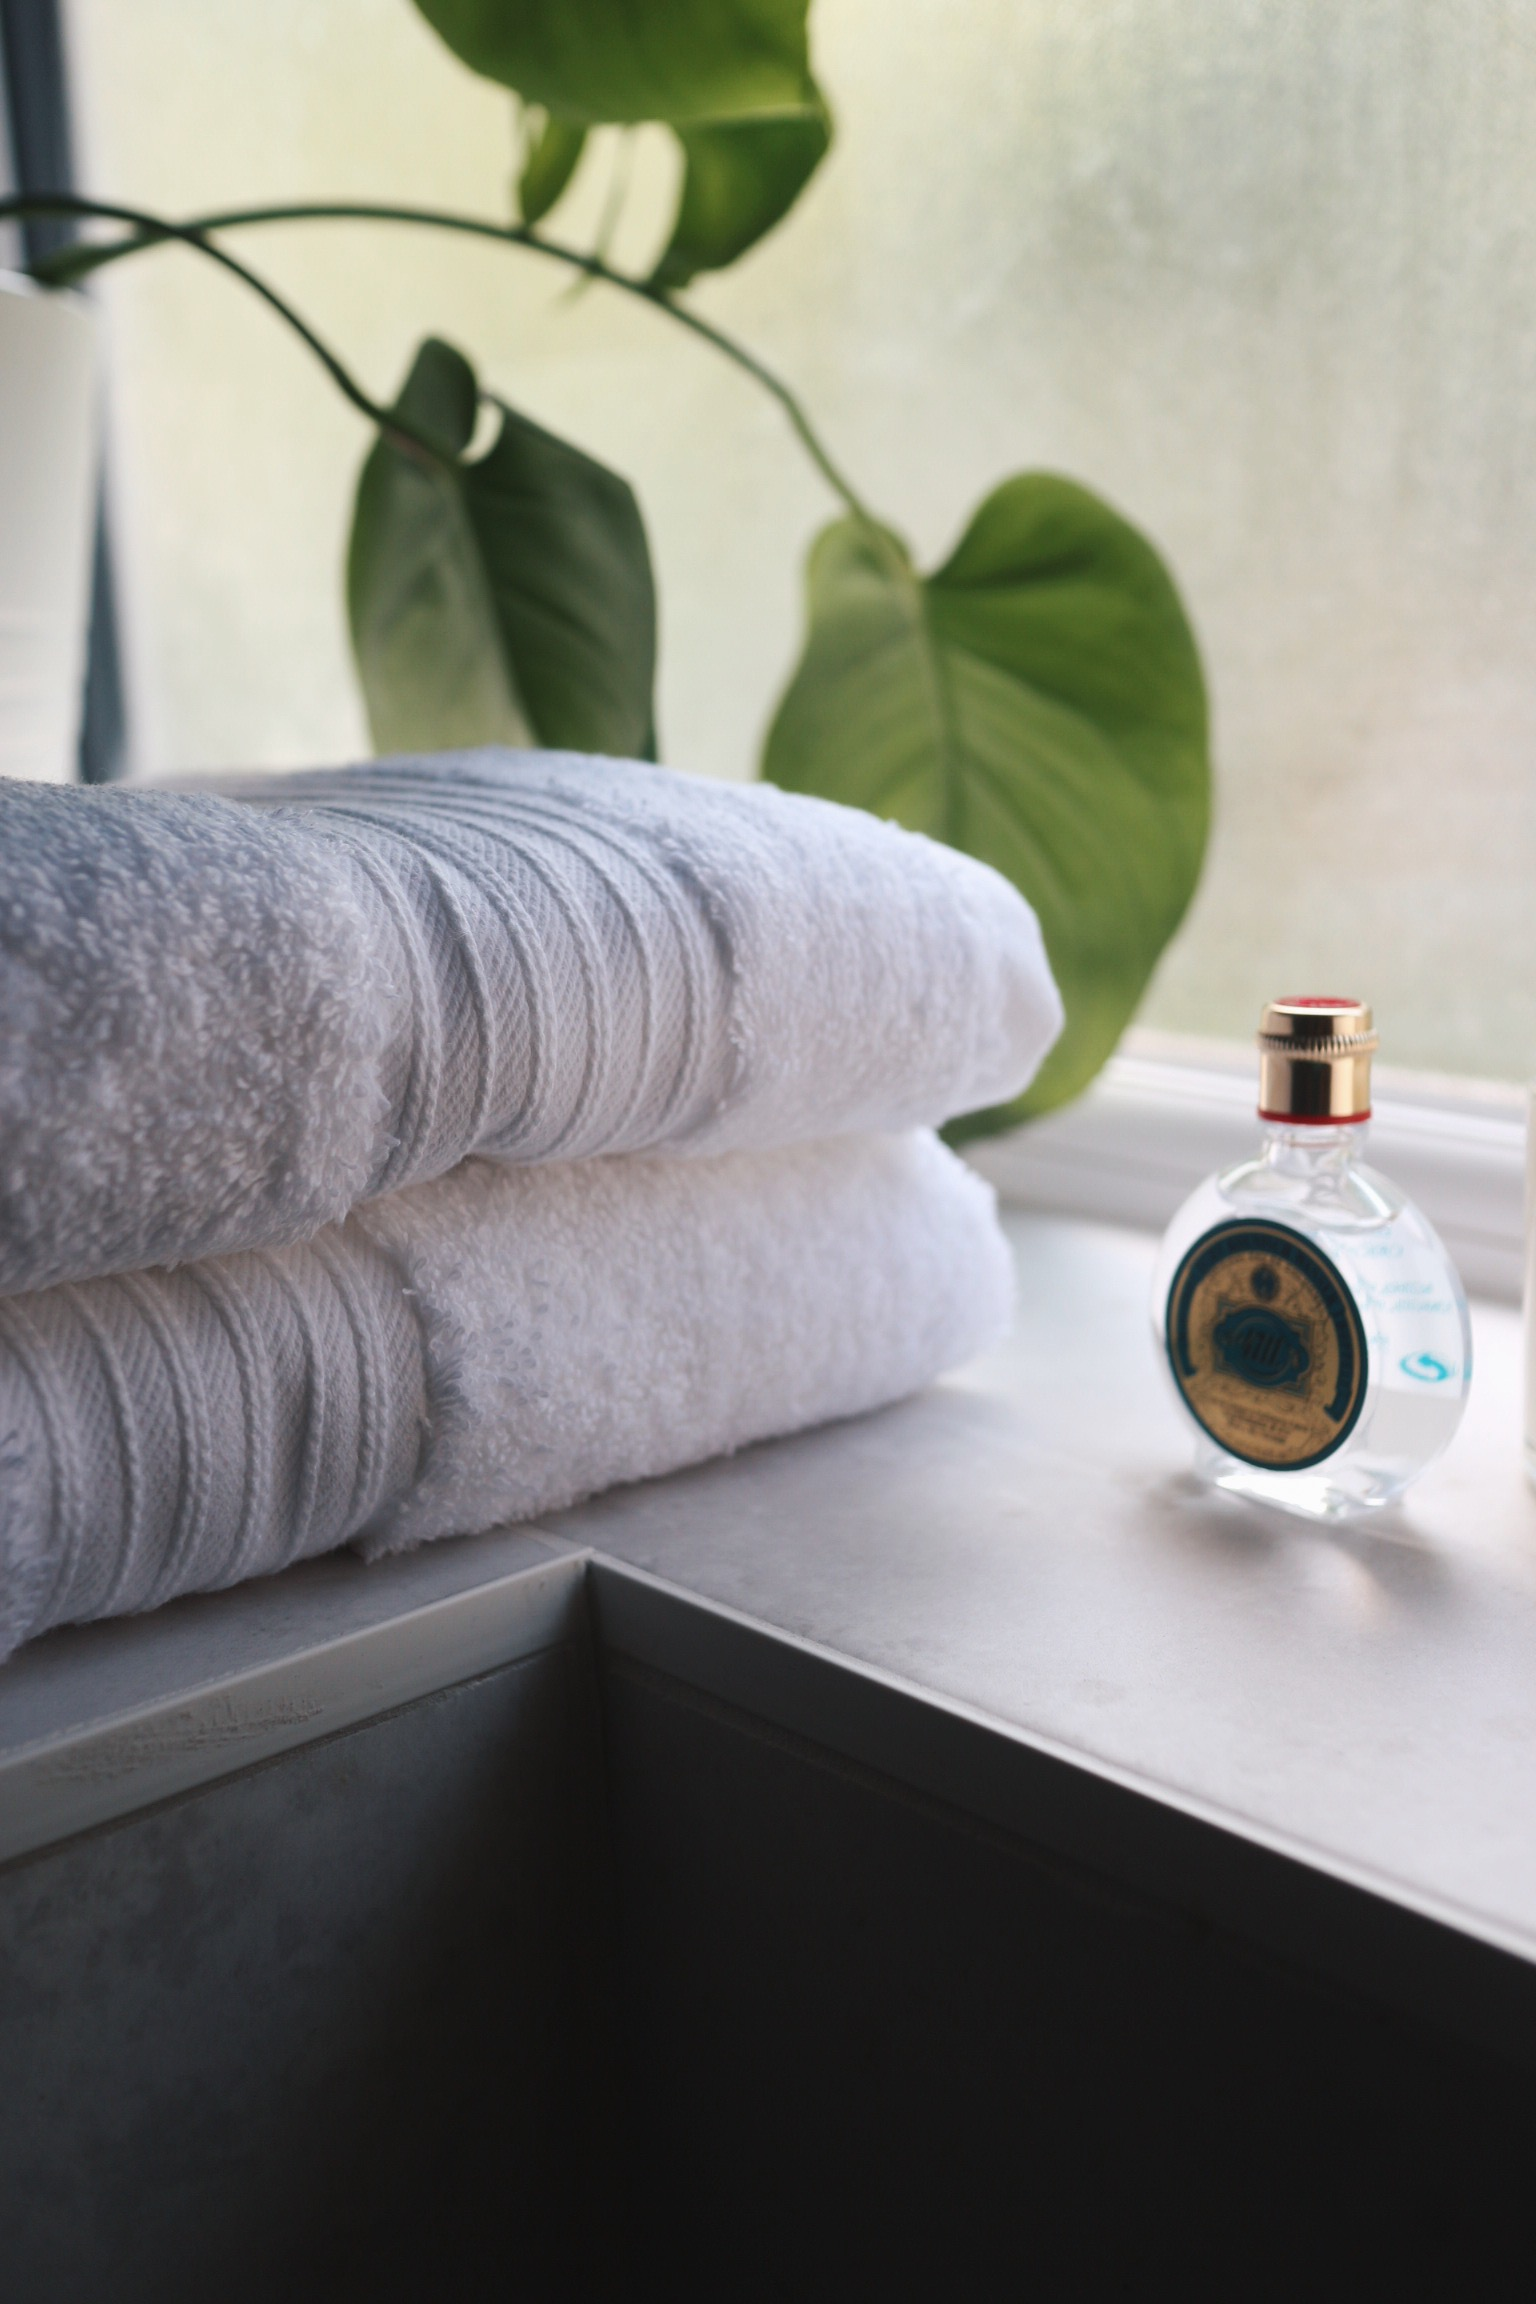 Soak & Sleep towels